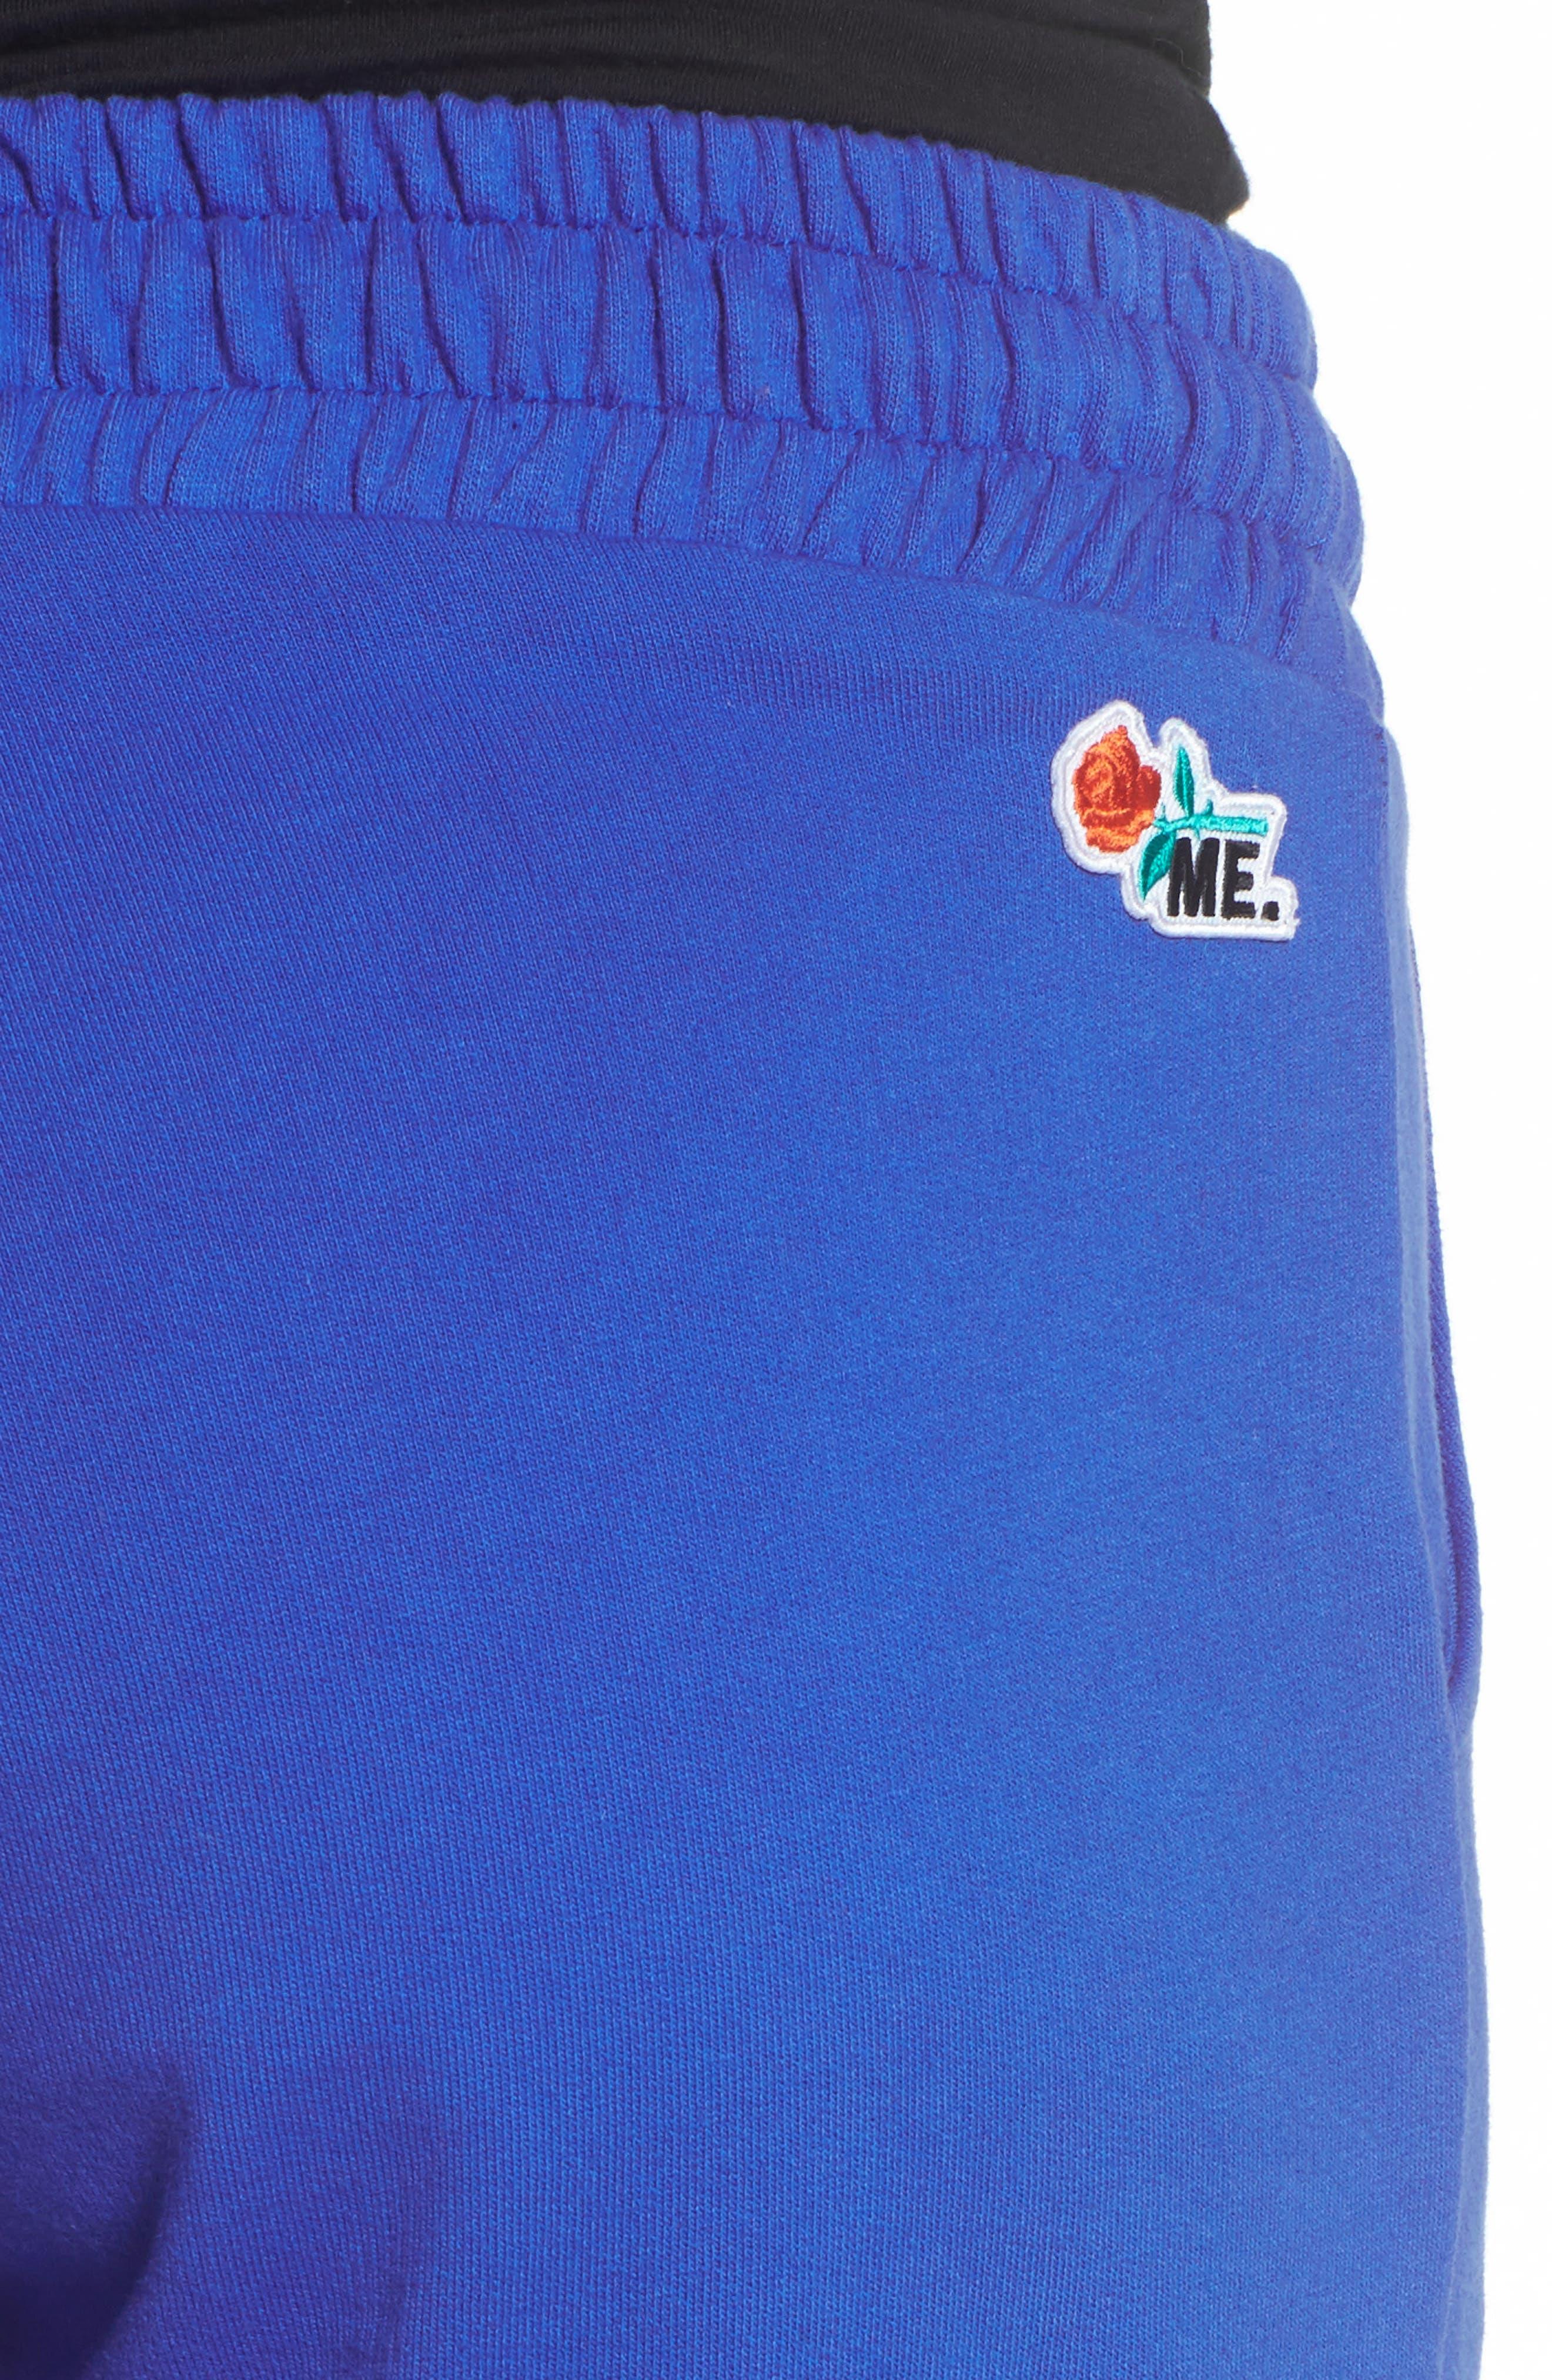 ME. Rose Sweatpants,                             Alternate thumbnail 6, color,                             400